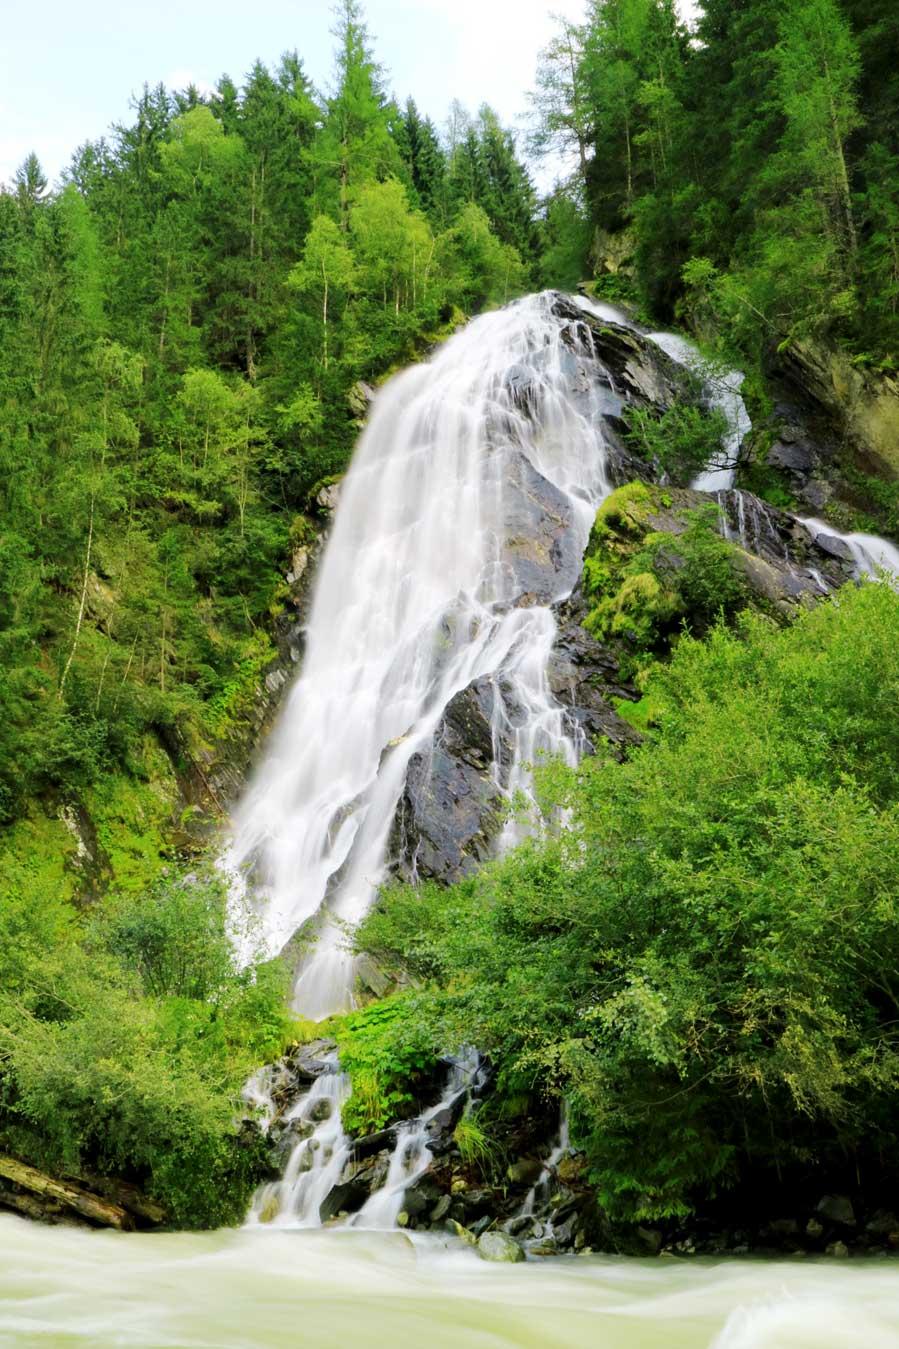 Lebensraum wasserfall, Osttirol - AllinMam.com